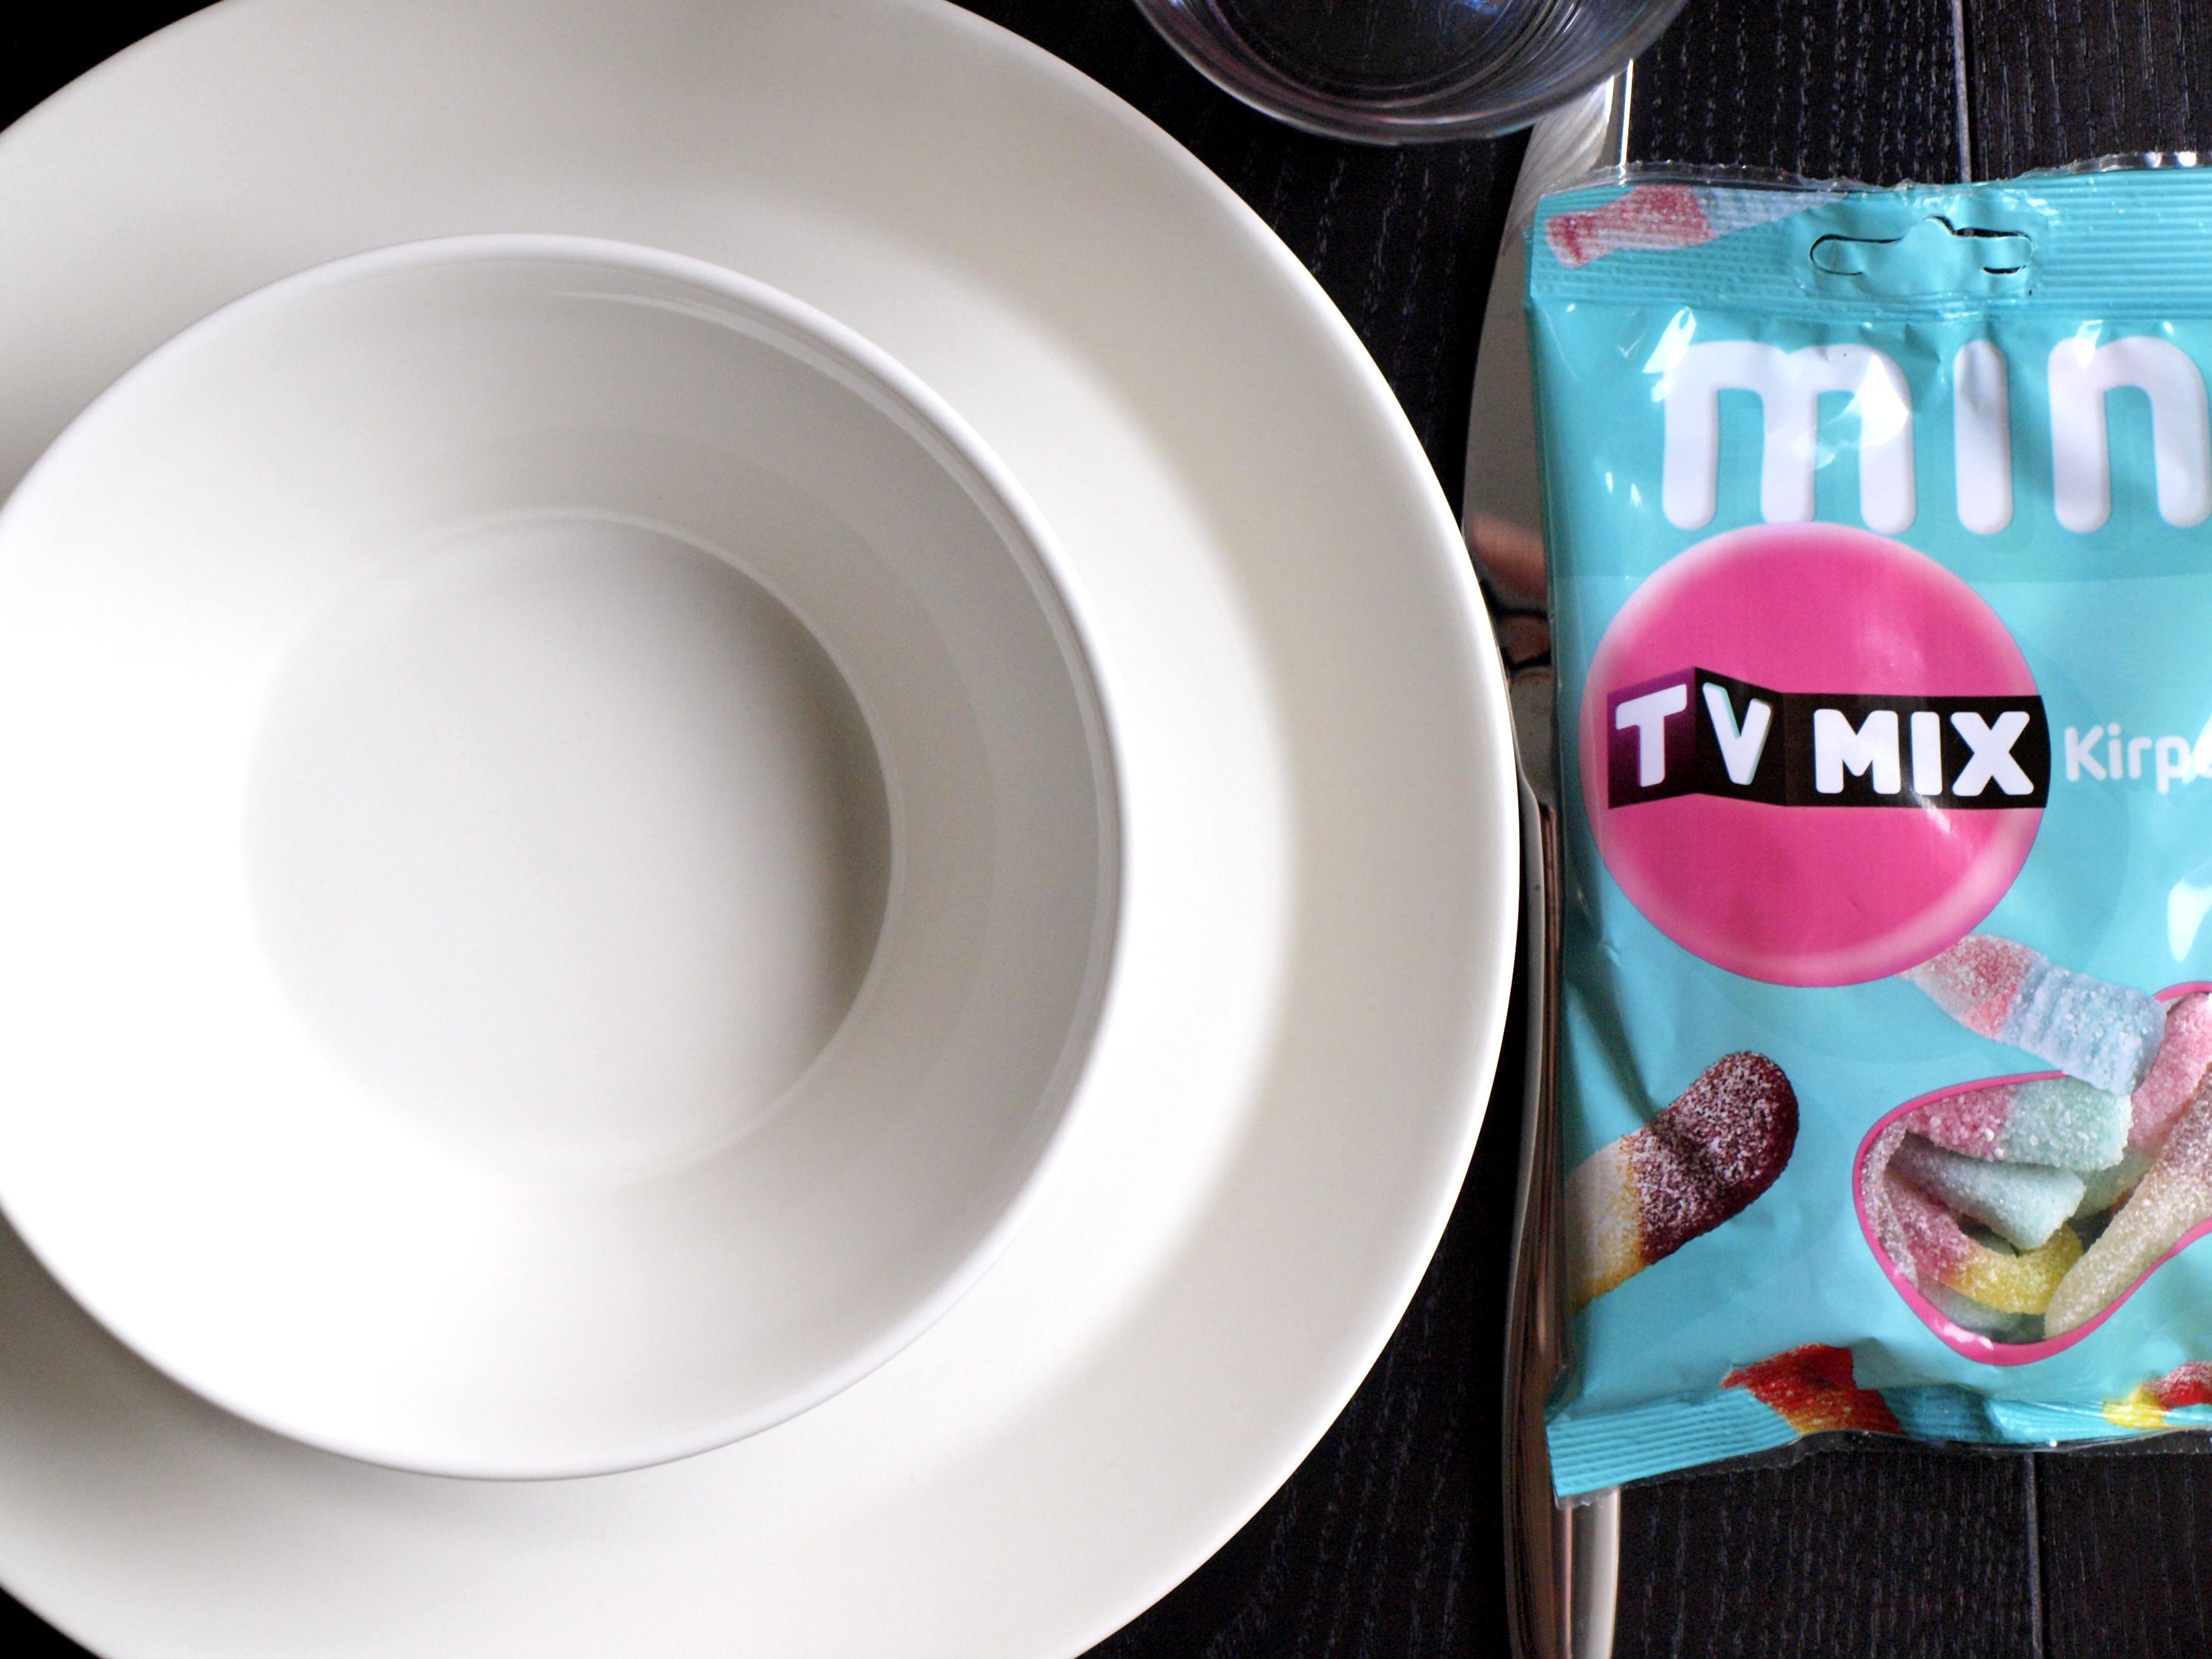 tv_mix_mini_kirpea.jpg